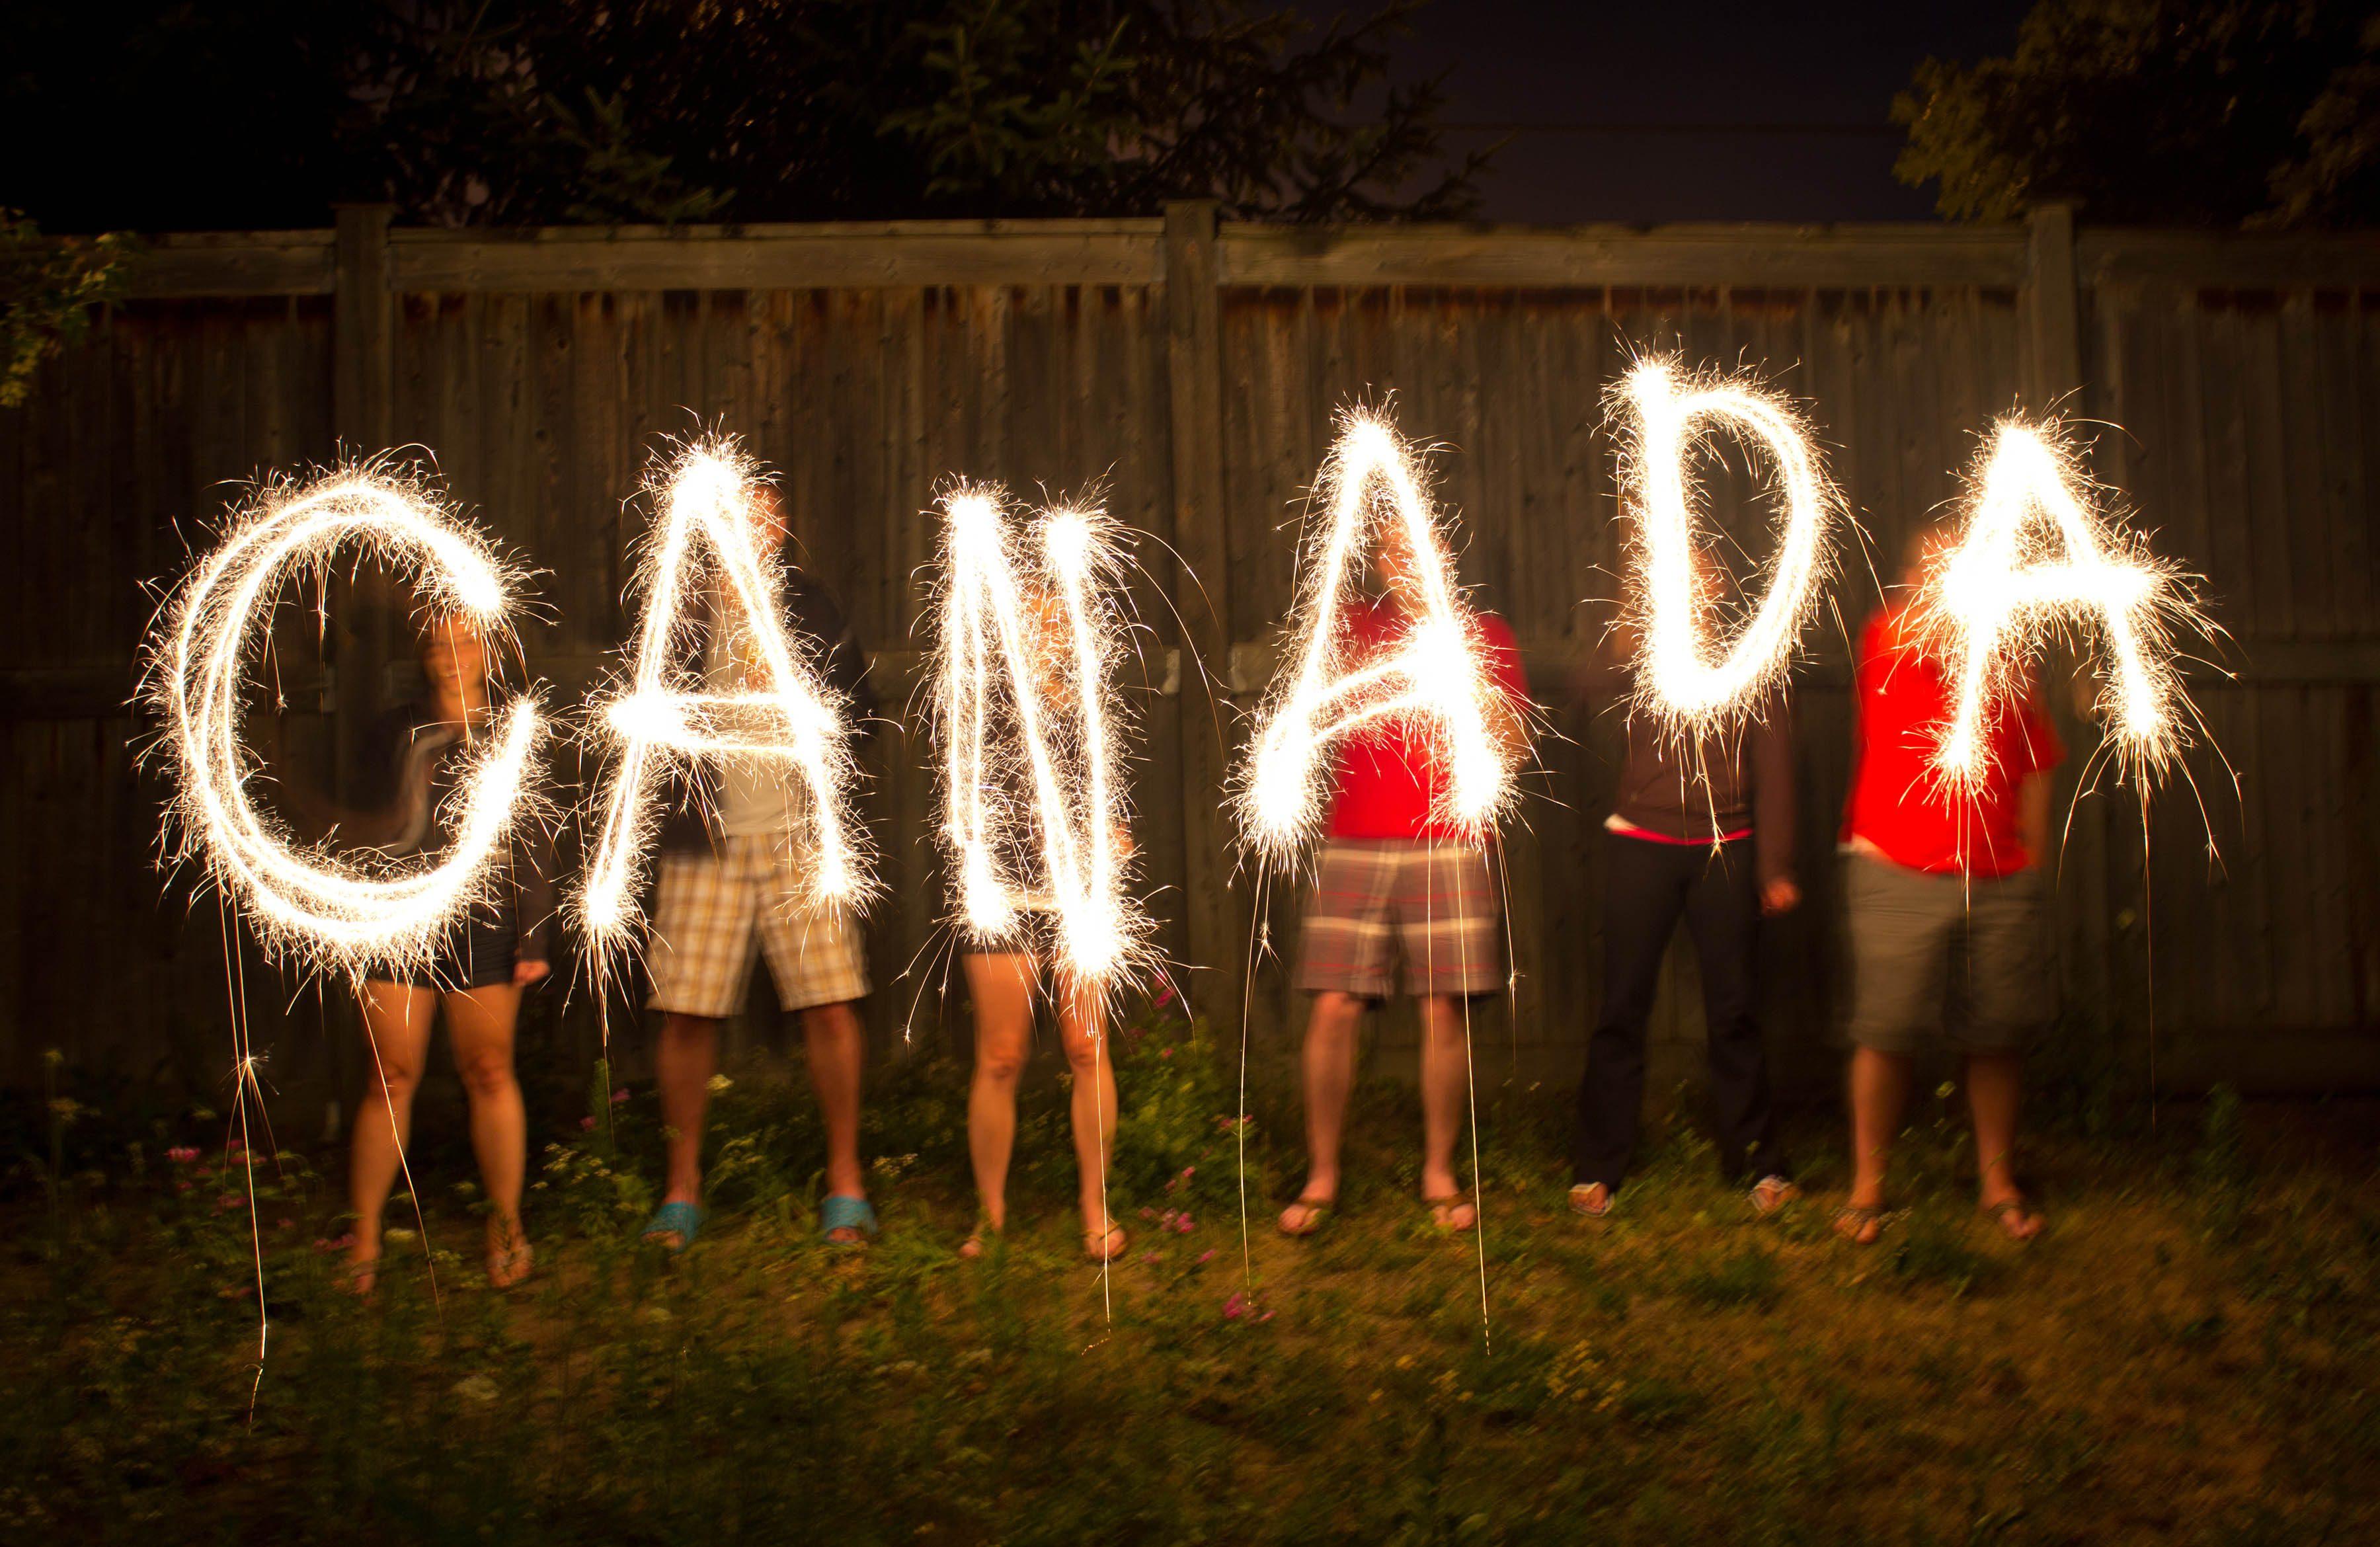 canada day 4 great ways to celebrate canadas birthday - How Does Canada Celebrate Christmas